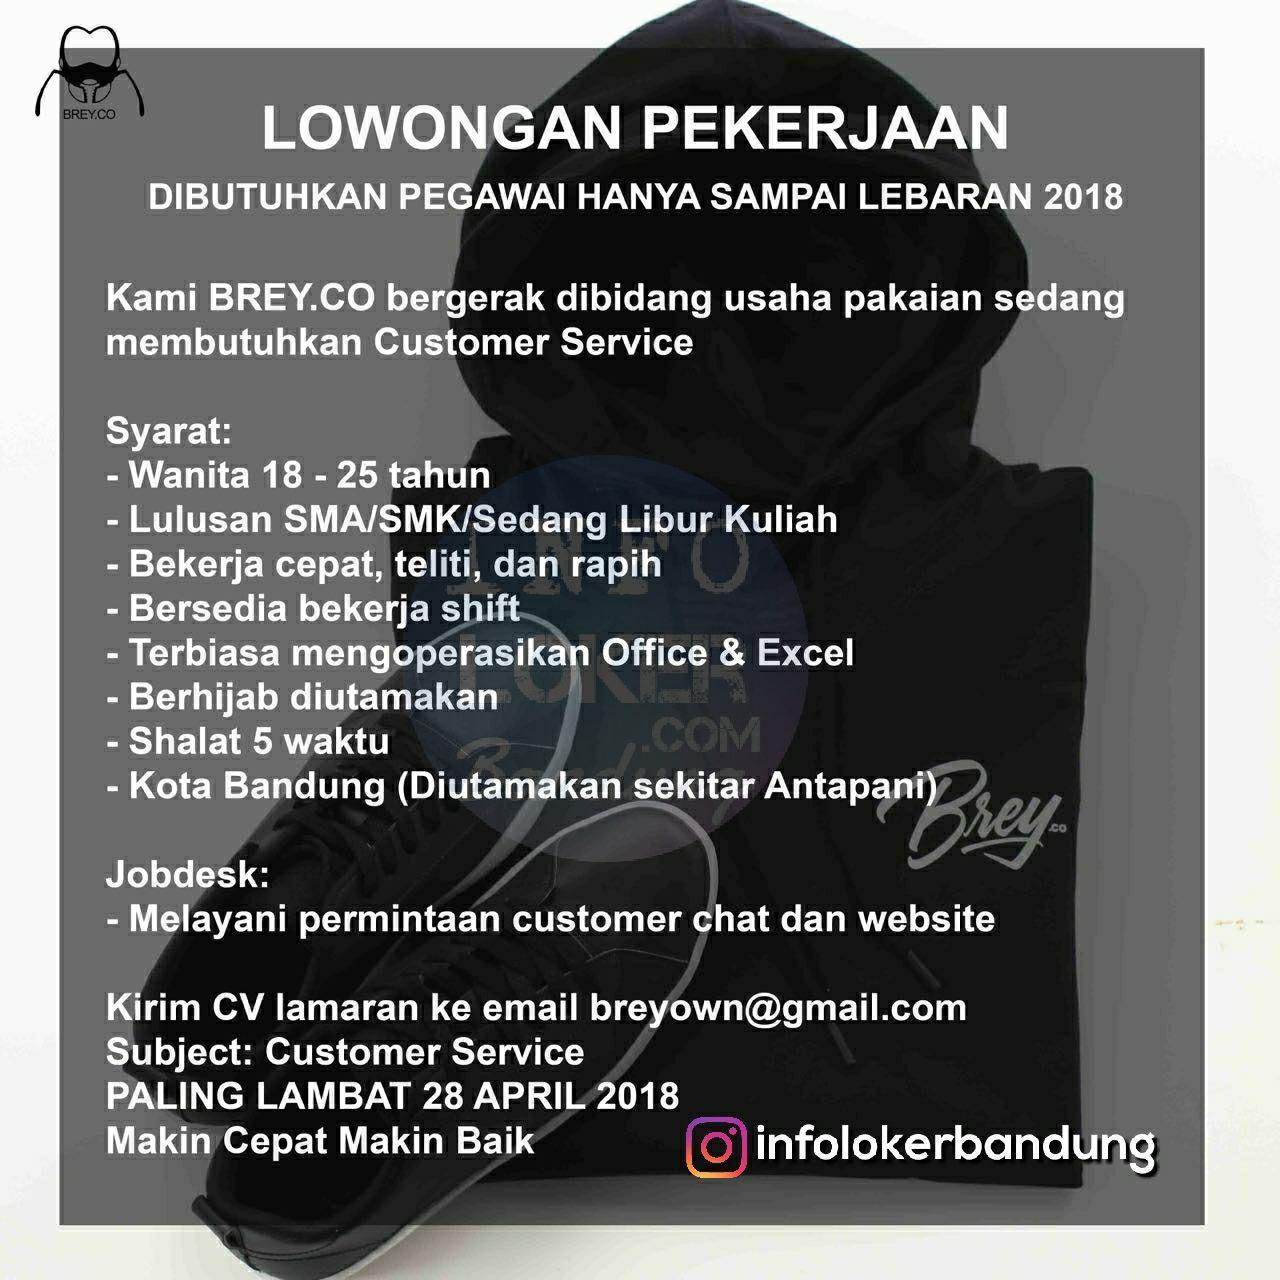 Lowongan Kerja Brey.Co Bandung April 2018